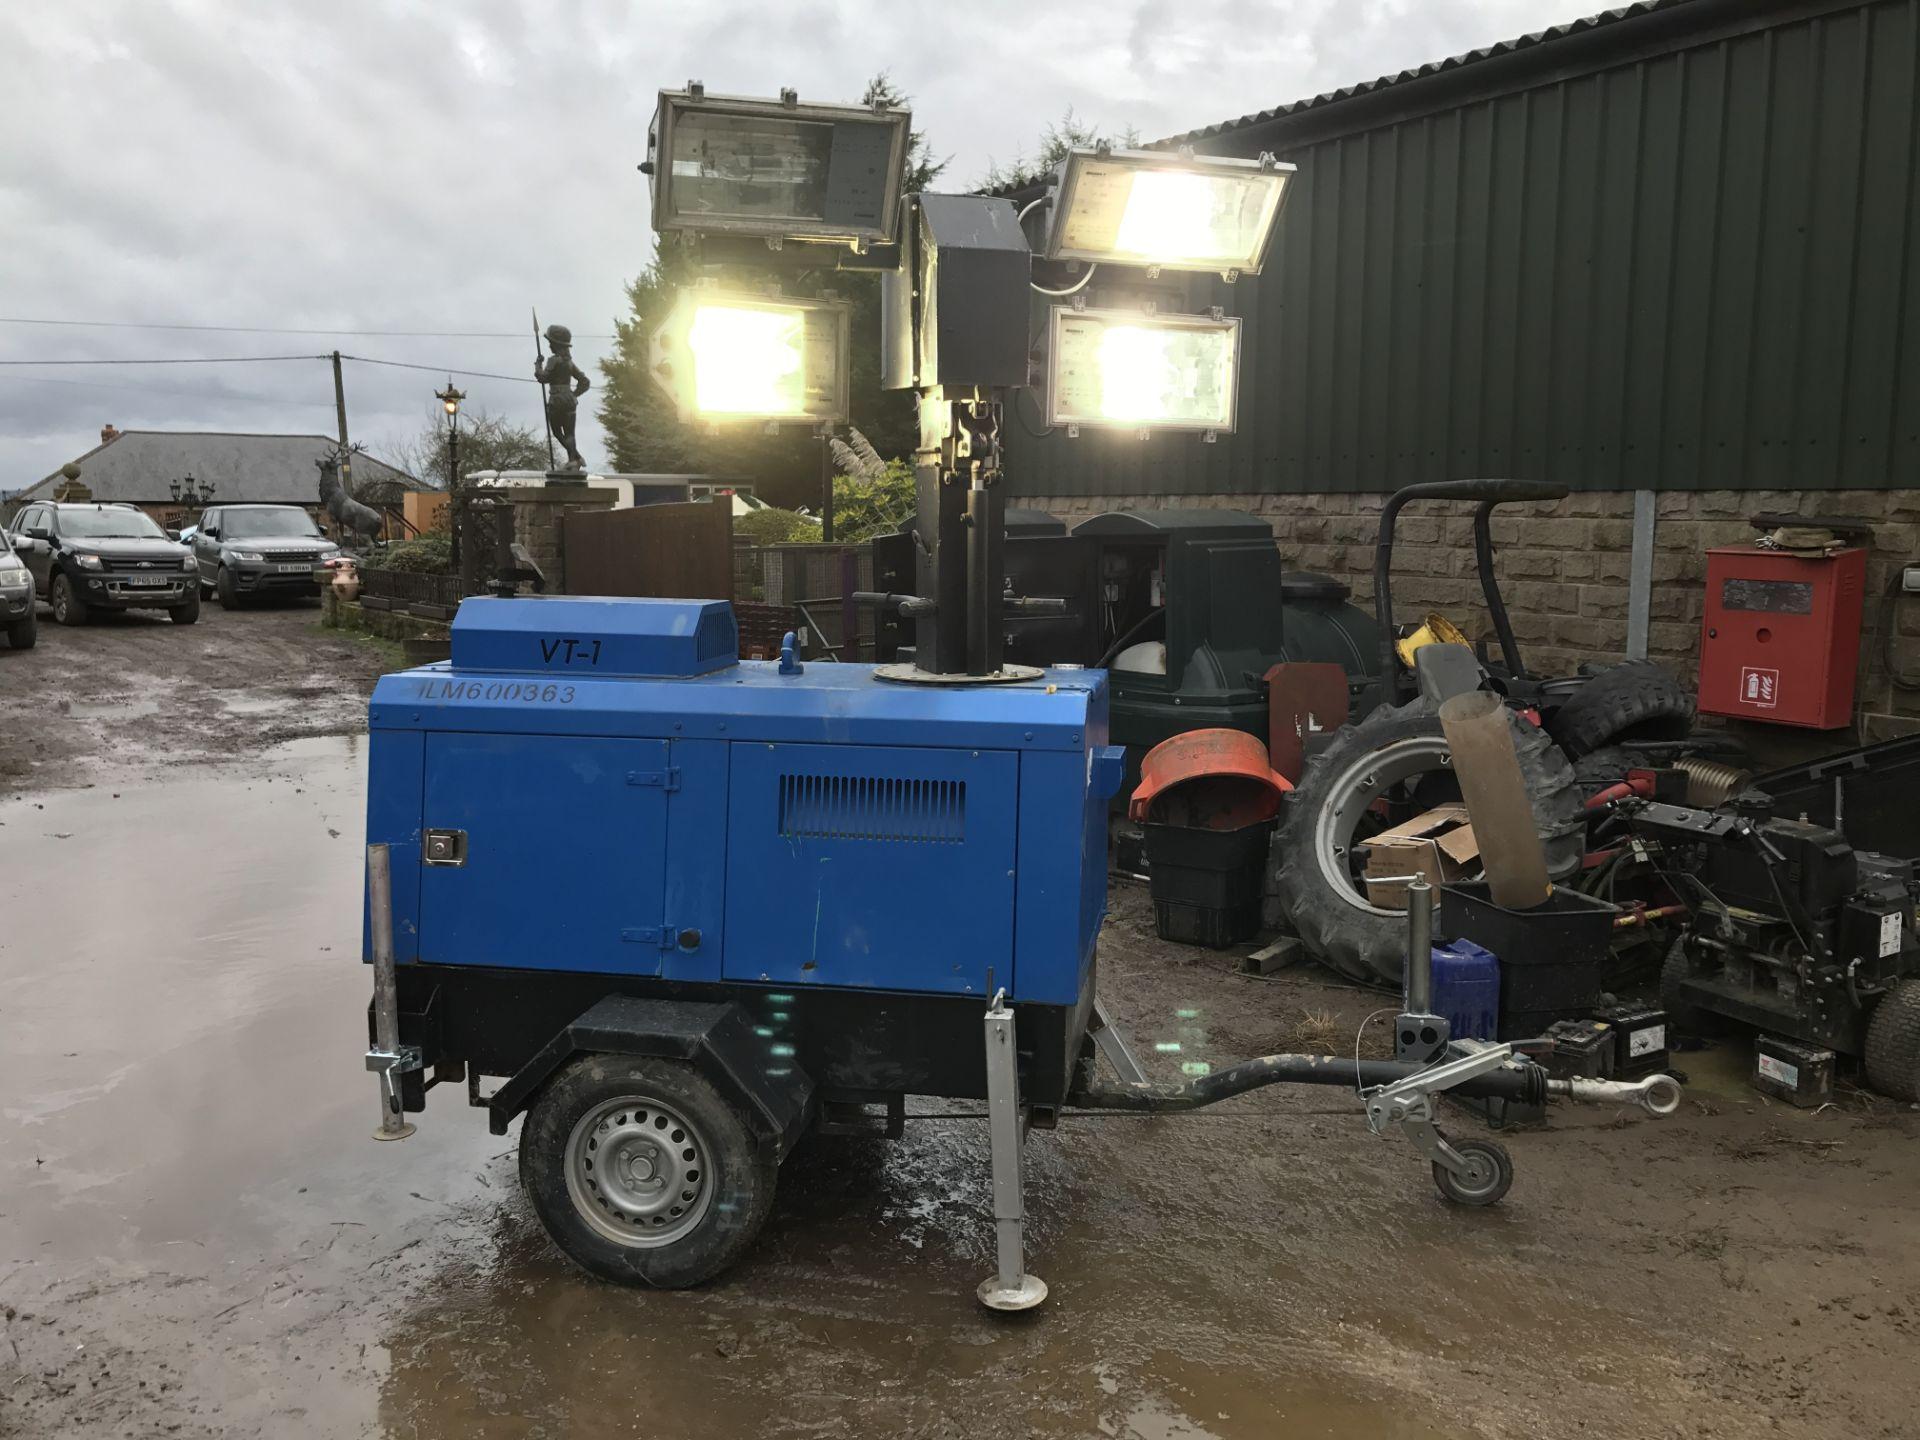 DS - VT1 LIGHTING TOWER / GENERATOR - DIESEL ENGINE DRIVEN *PLUS VAT*  SUPER LIGHT VT 1 STARTS